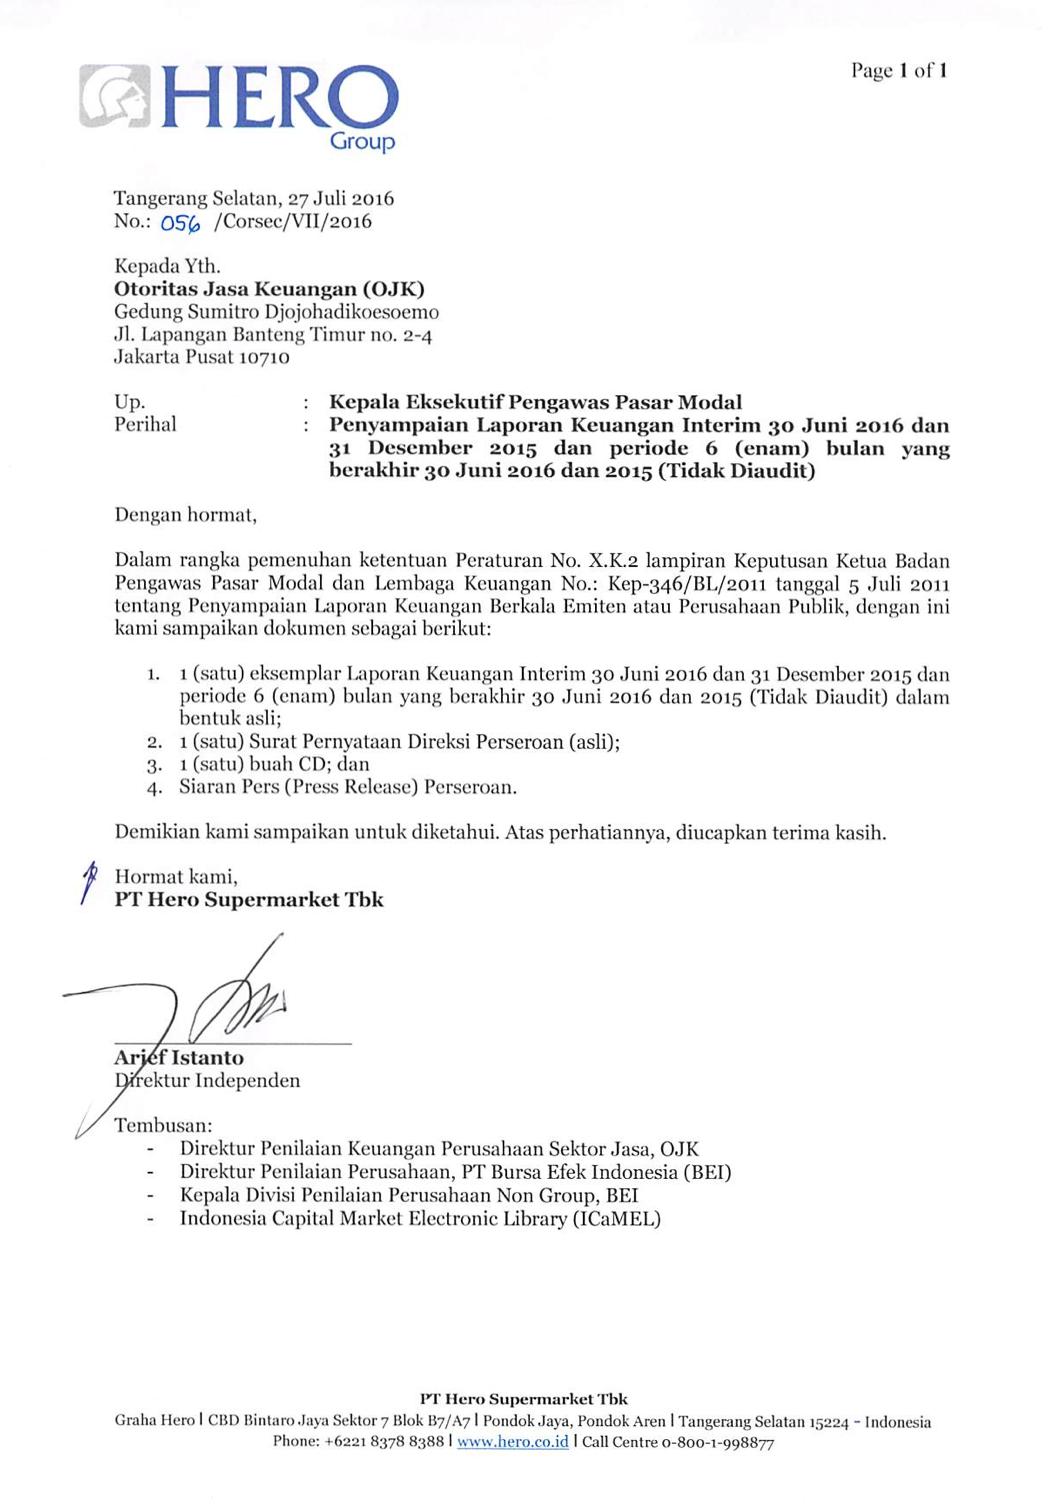 Contoh Laporan Keuangan Perusahaan Yang Telah Diaudit Kumpulan Contoh Laporan